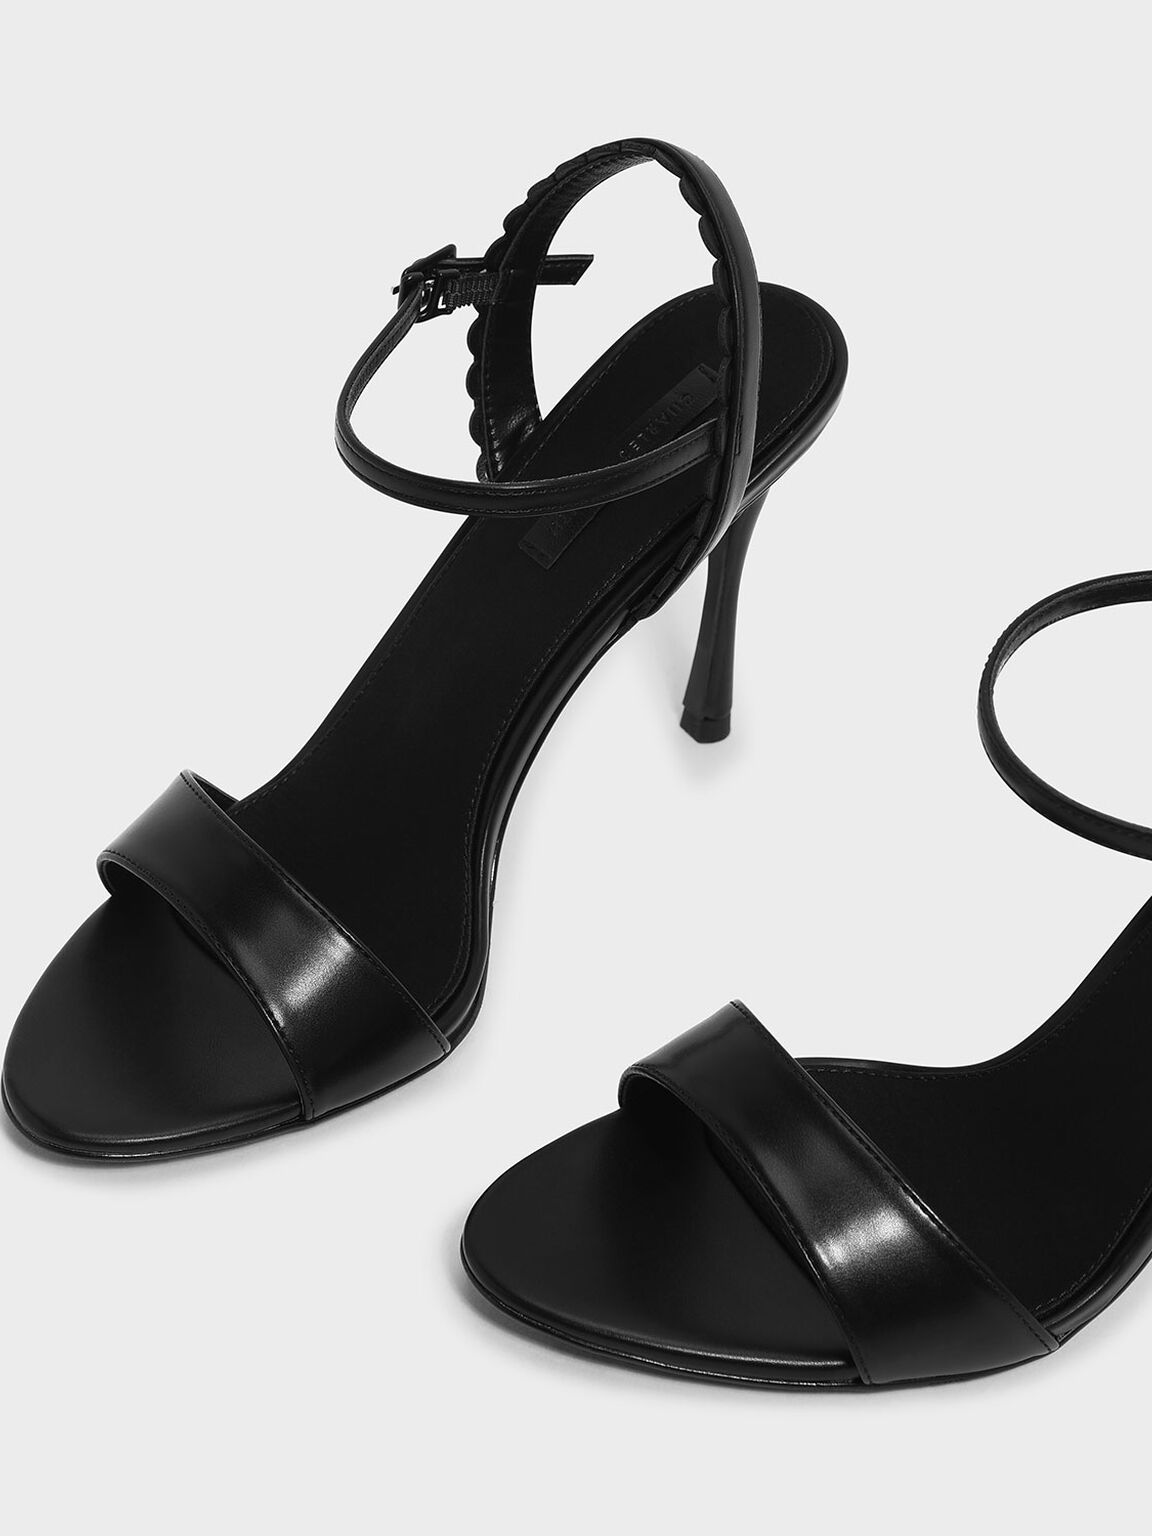 Scallop Edge Detail Heeled Sandals, Black, hi-res